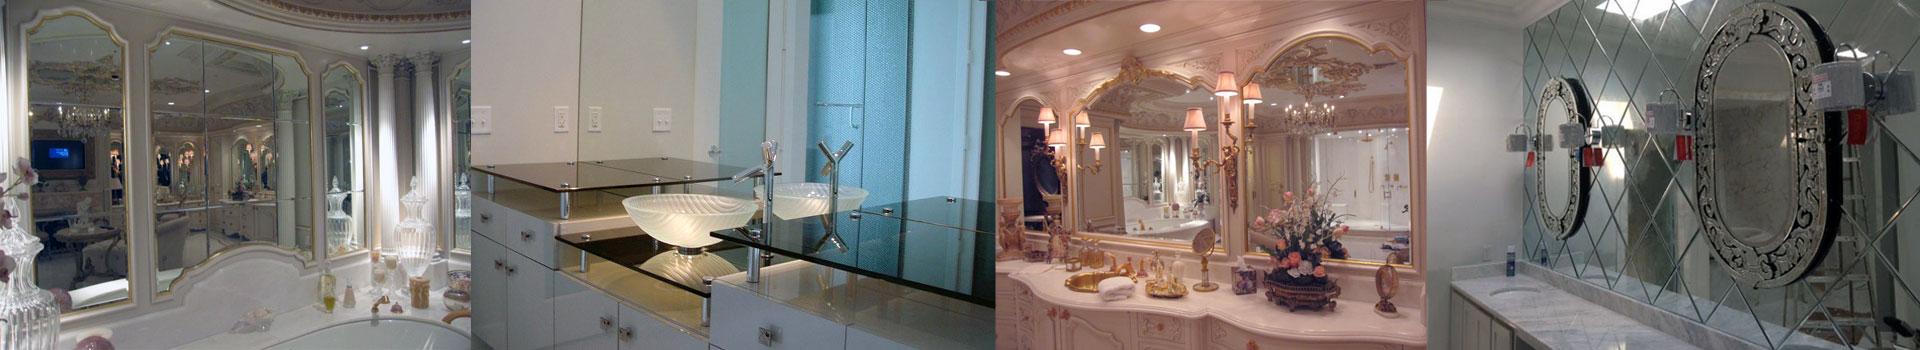 custom mirror fabrication and installation in dallas, texas